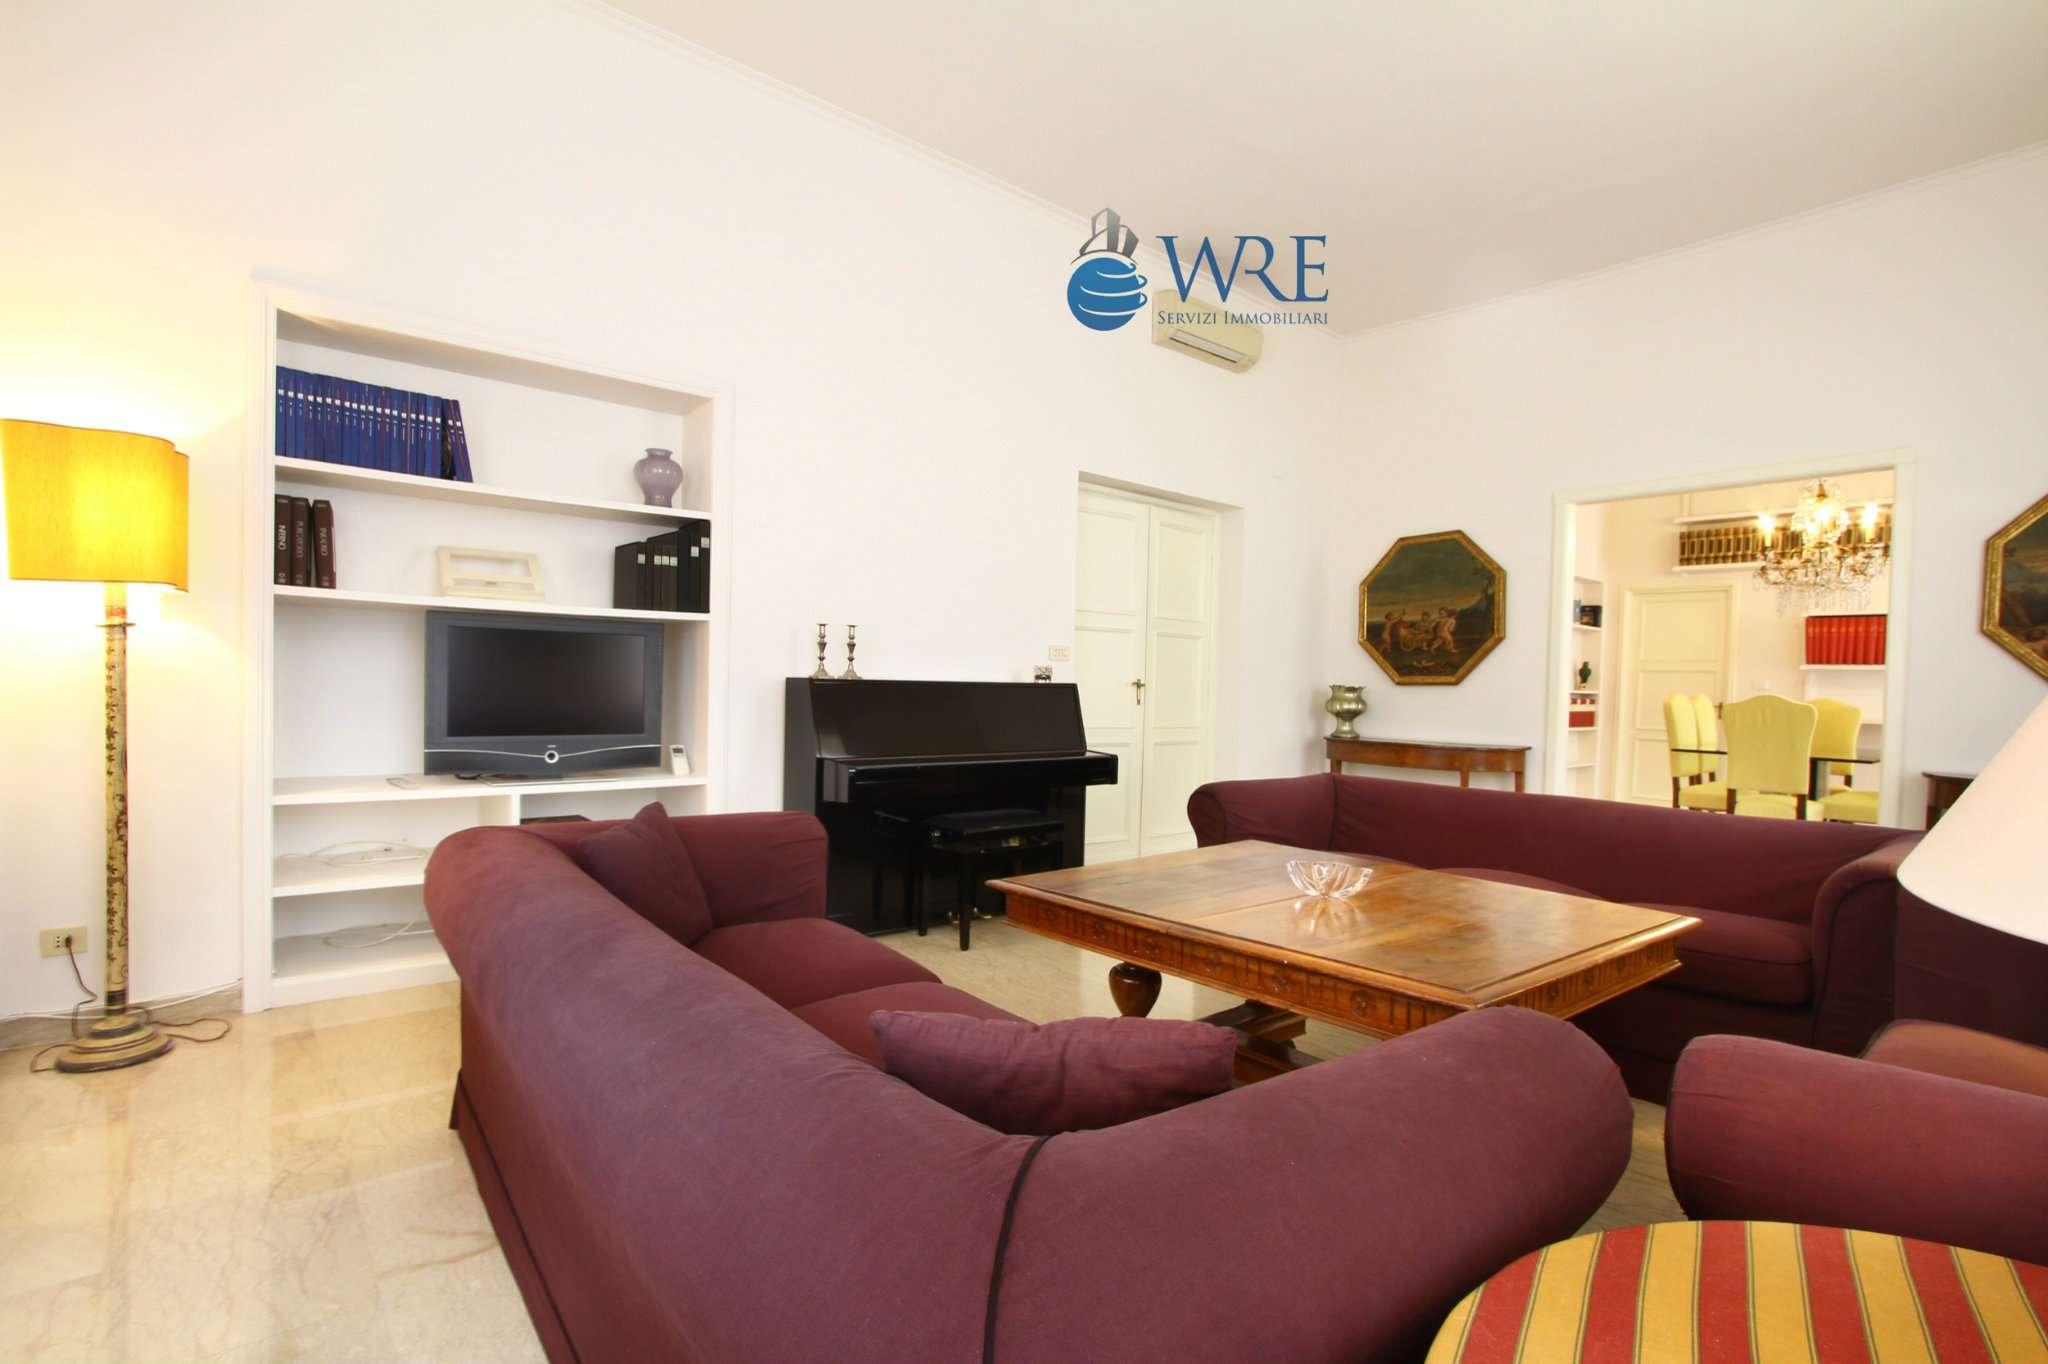 appartamento roma affitto 2300 euro zona 3 trieste 01